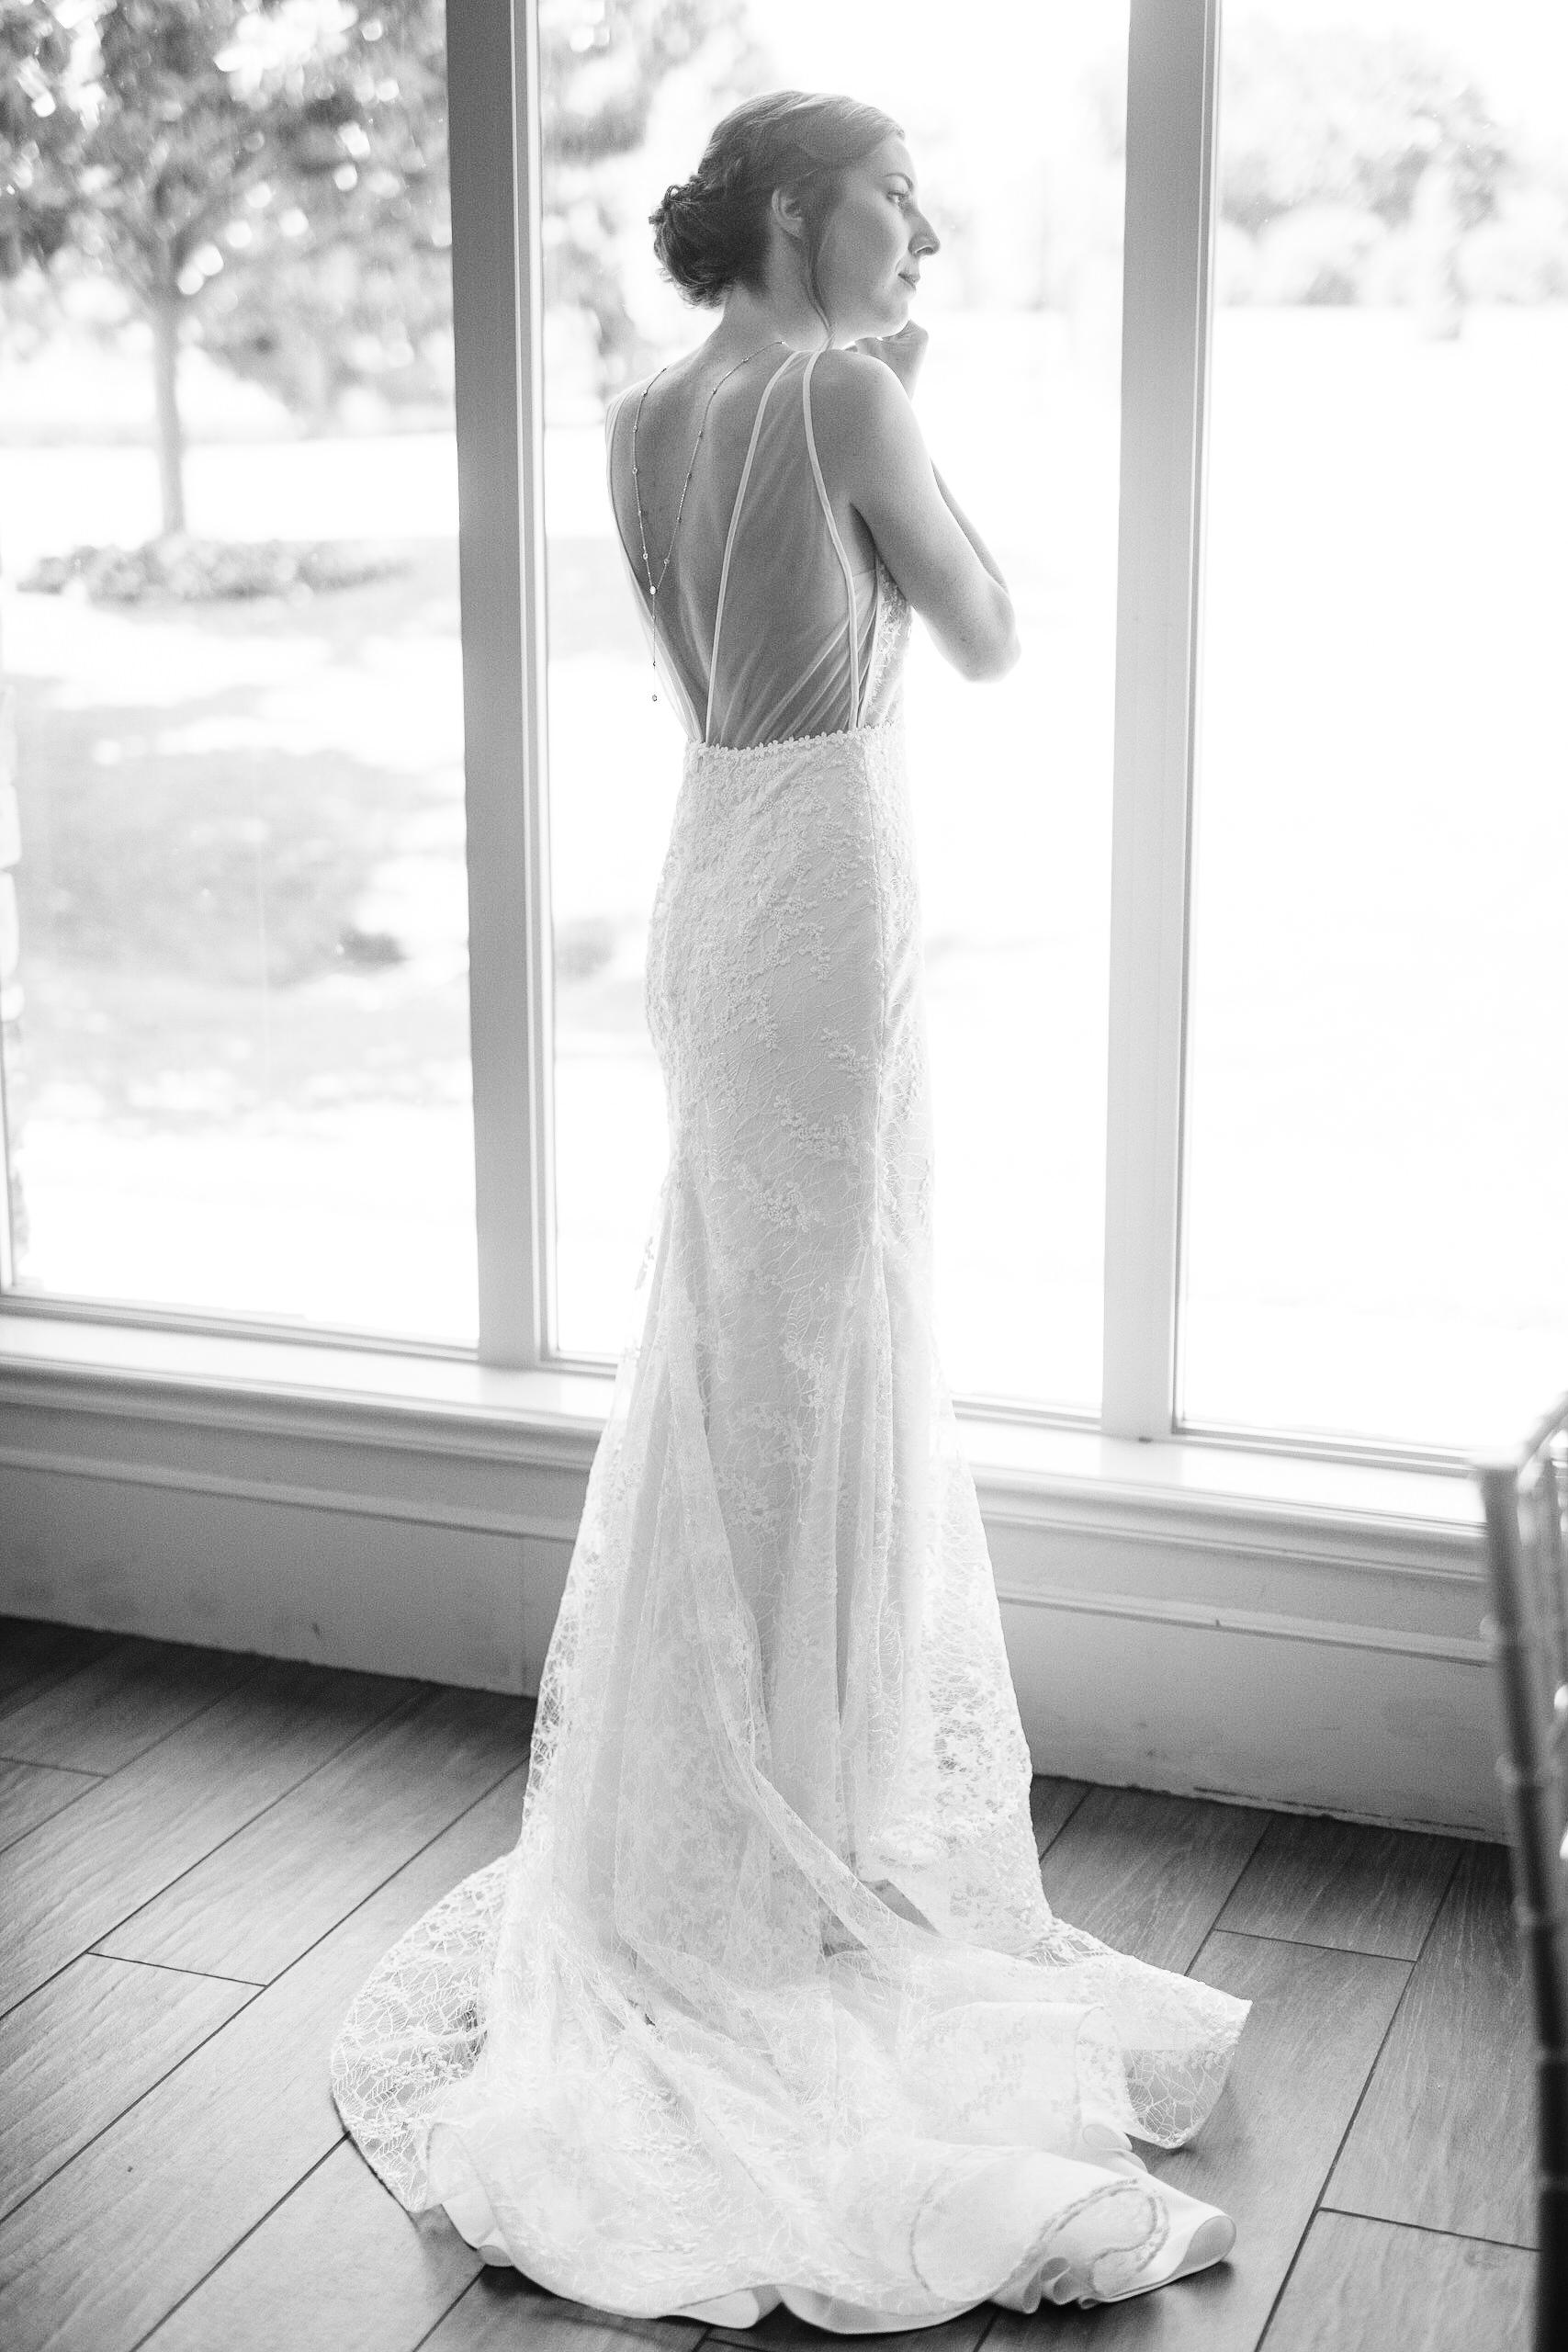 okc-wedding-photographer-coles-garden-wedding-okc-best-wedding-photographers-31.jpg